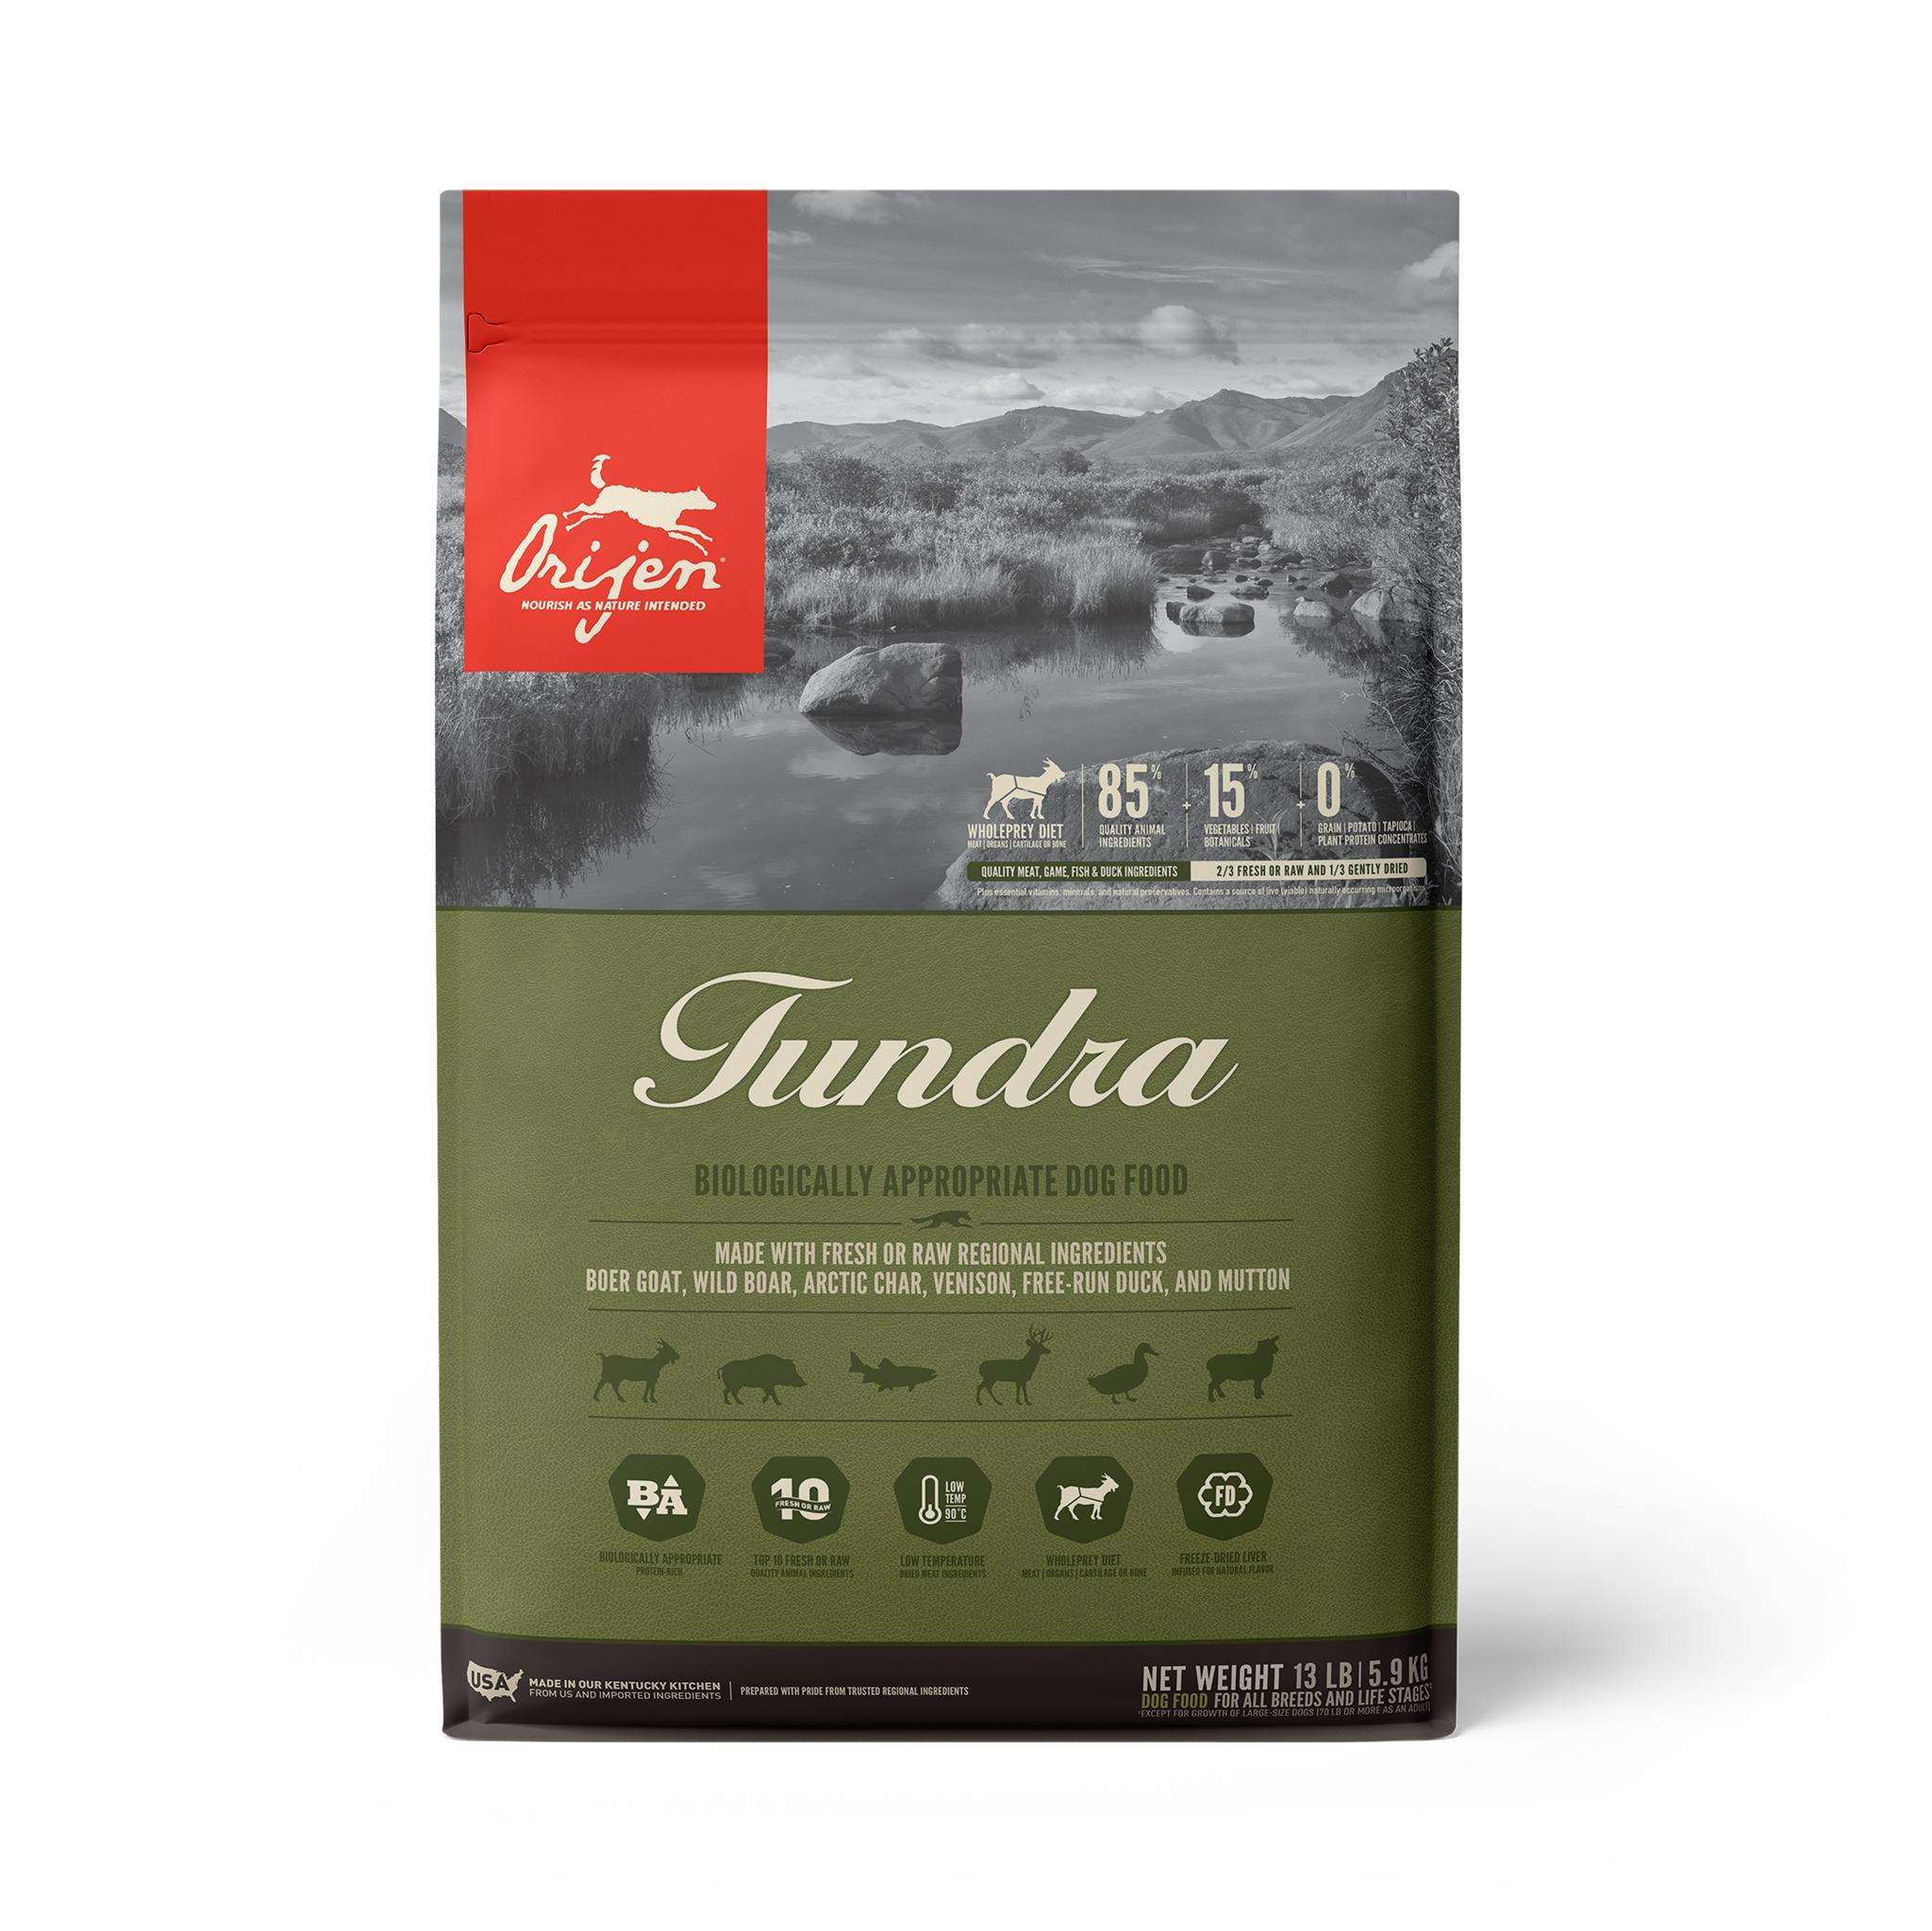 ORIJEN Tundra Grain-Free Dry Dog Food, 13-lb